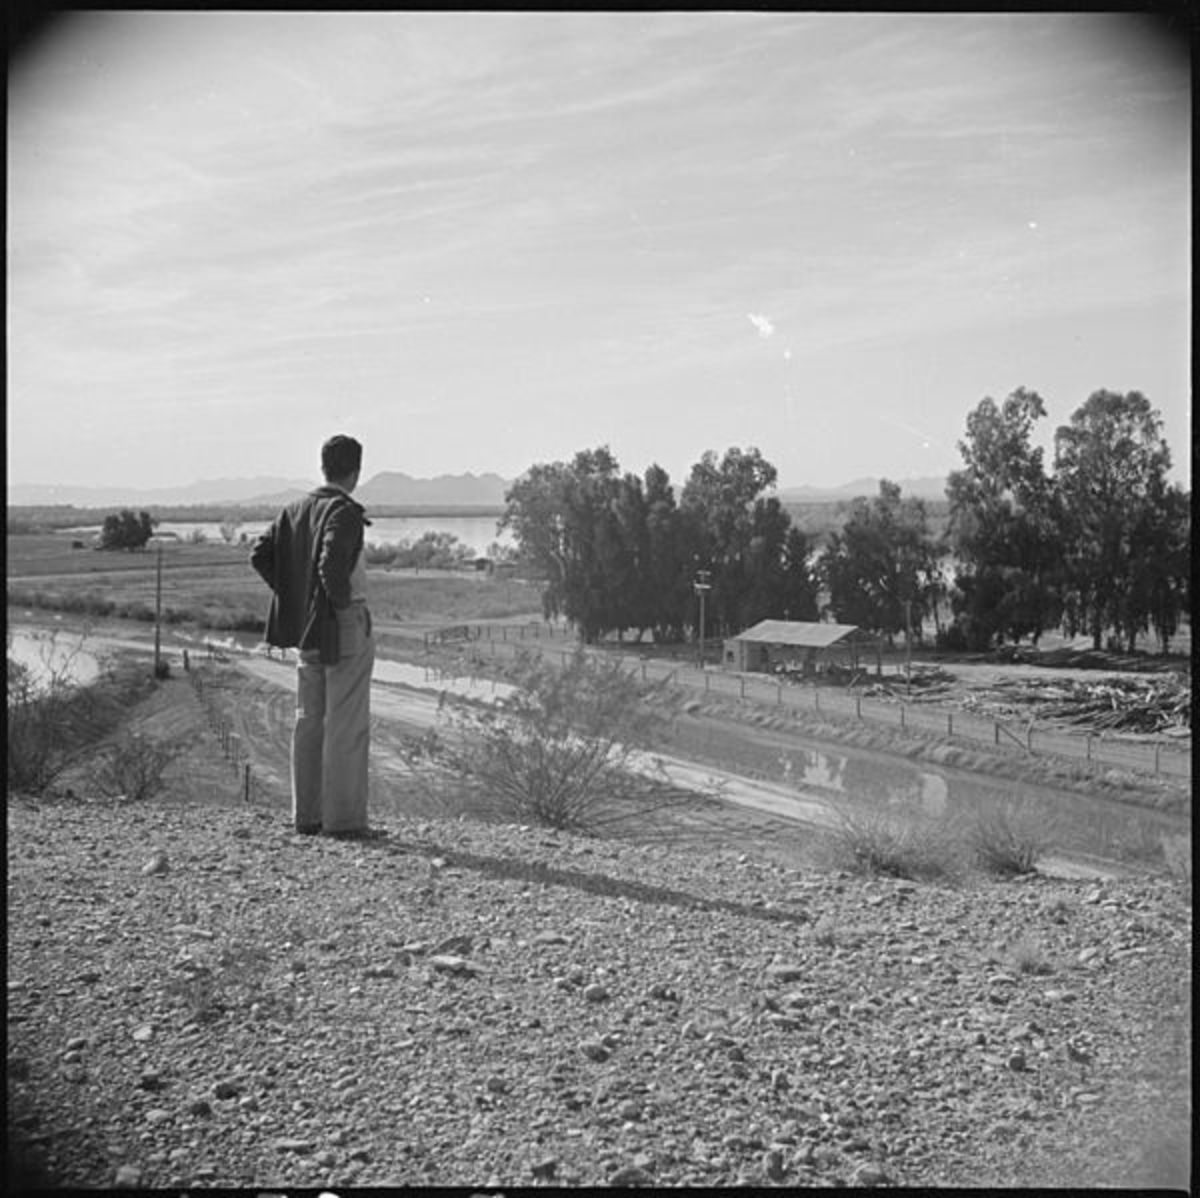 Poston, Arizona.  Overlooking a typical Arizona irrigation canal.